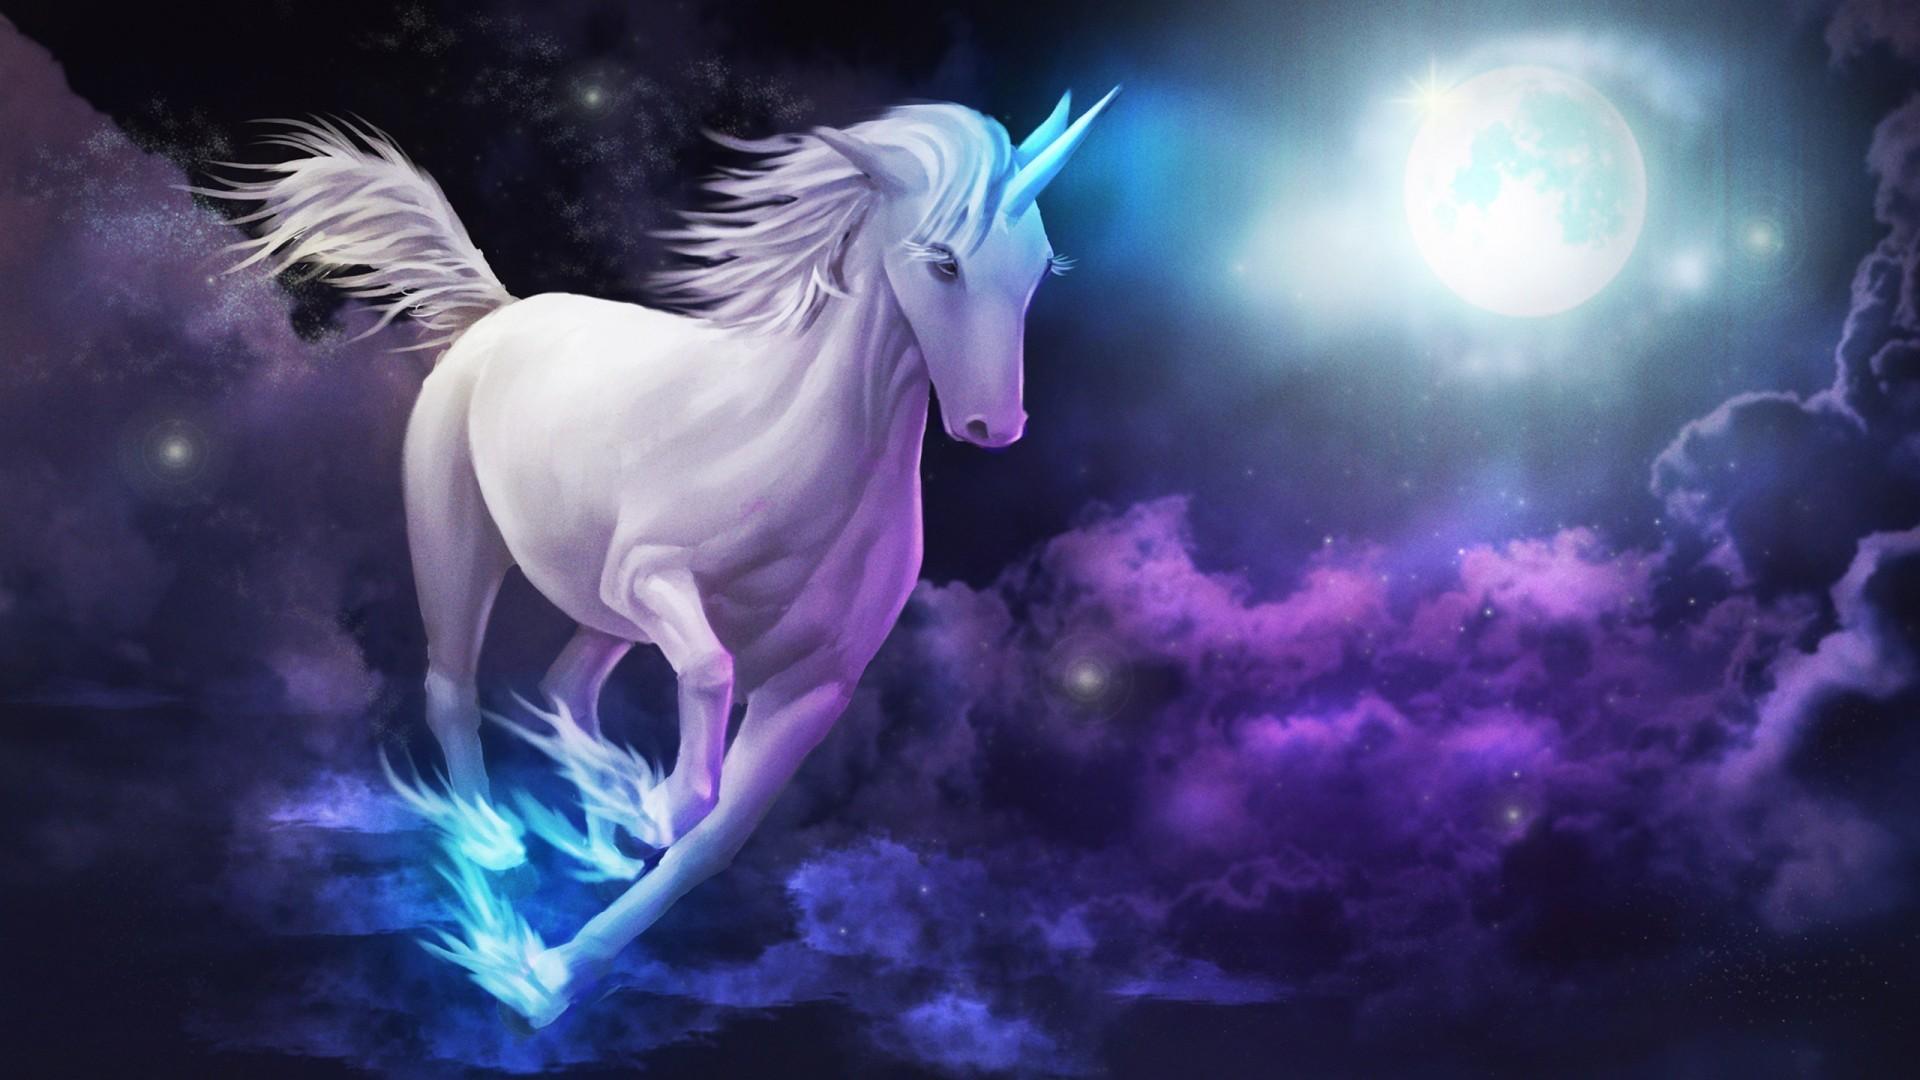 Unicorn Backgrounds For Desktop 69 Images